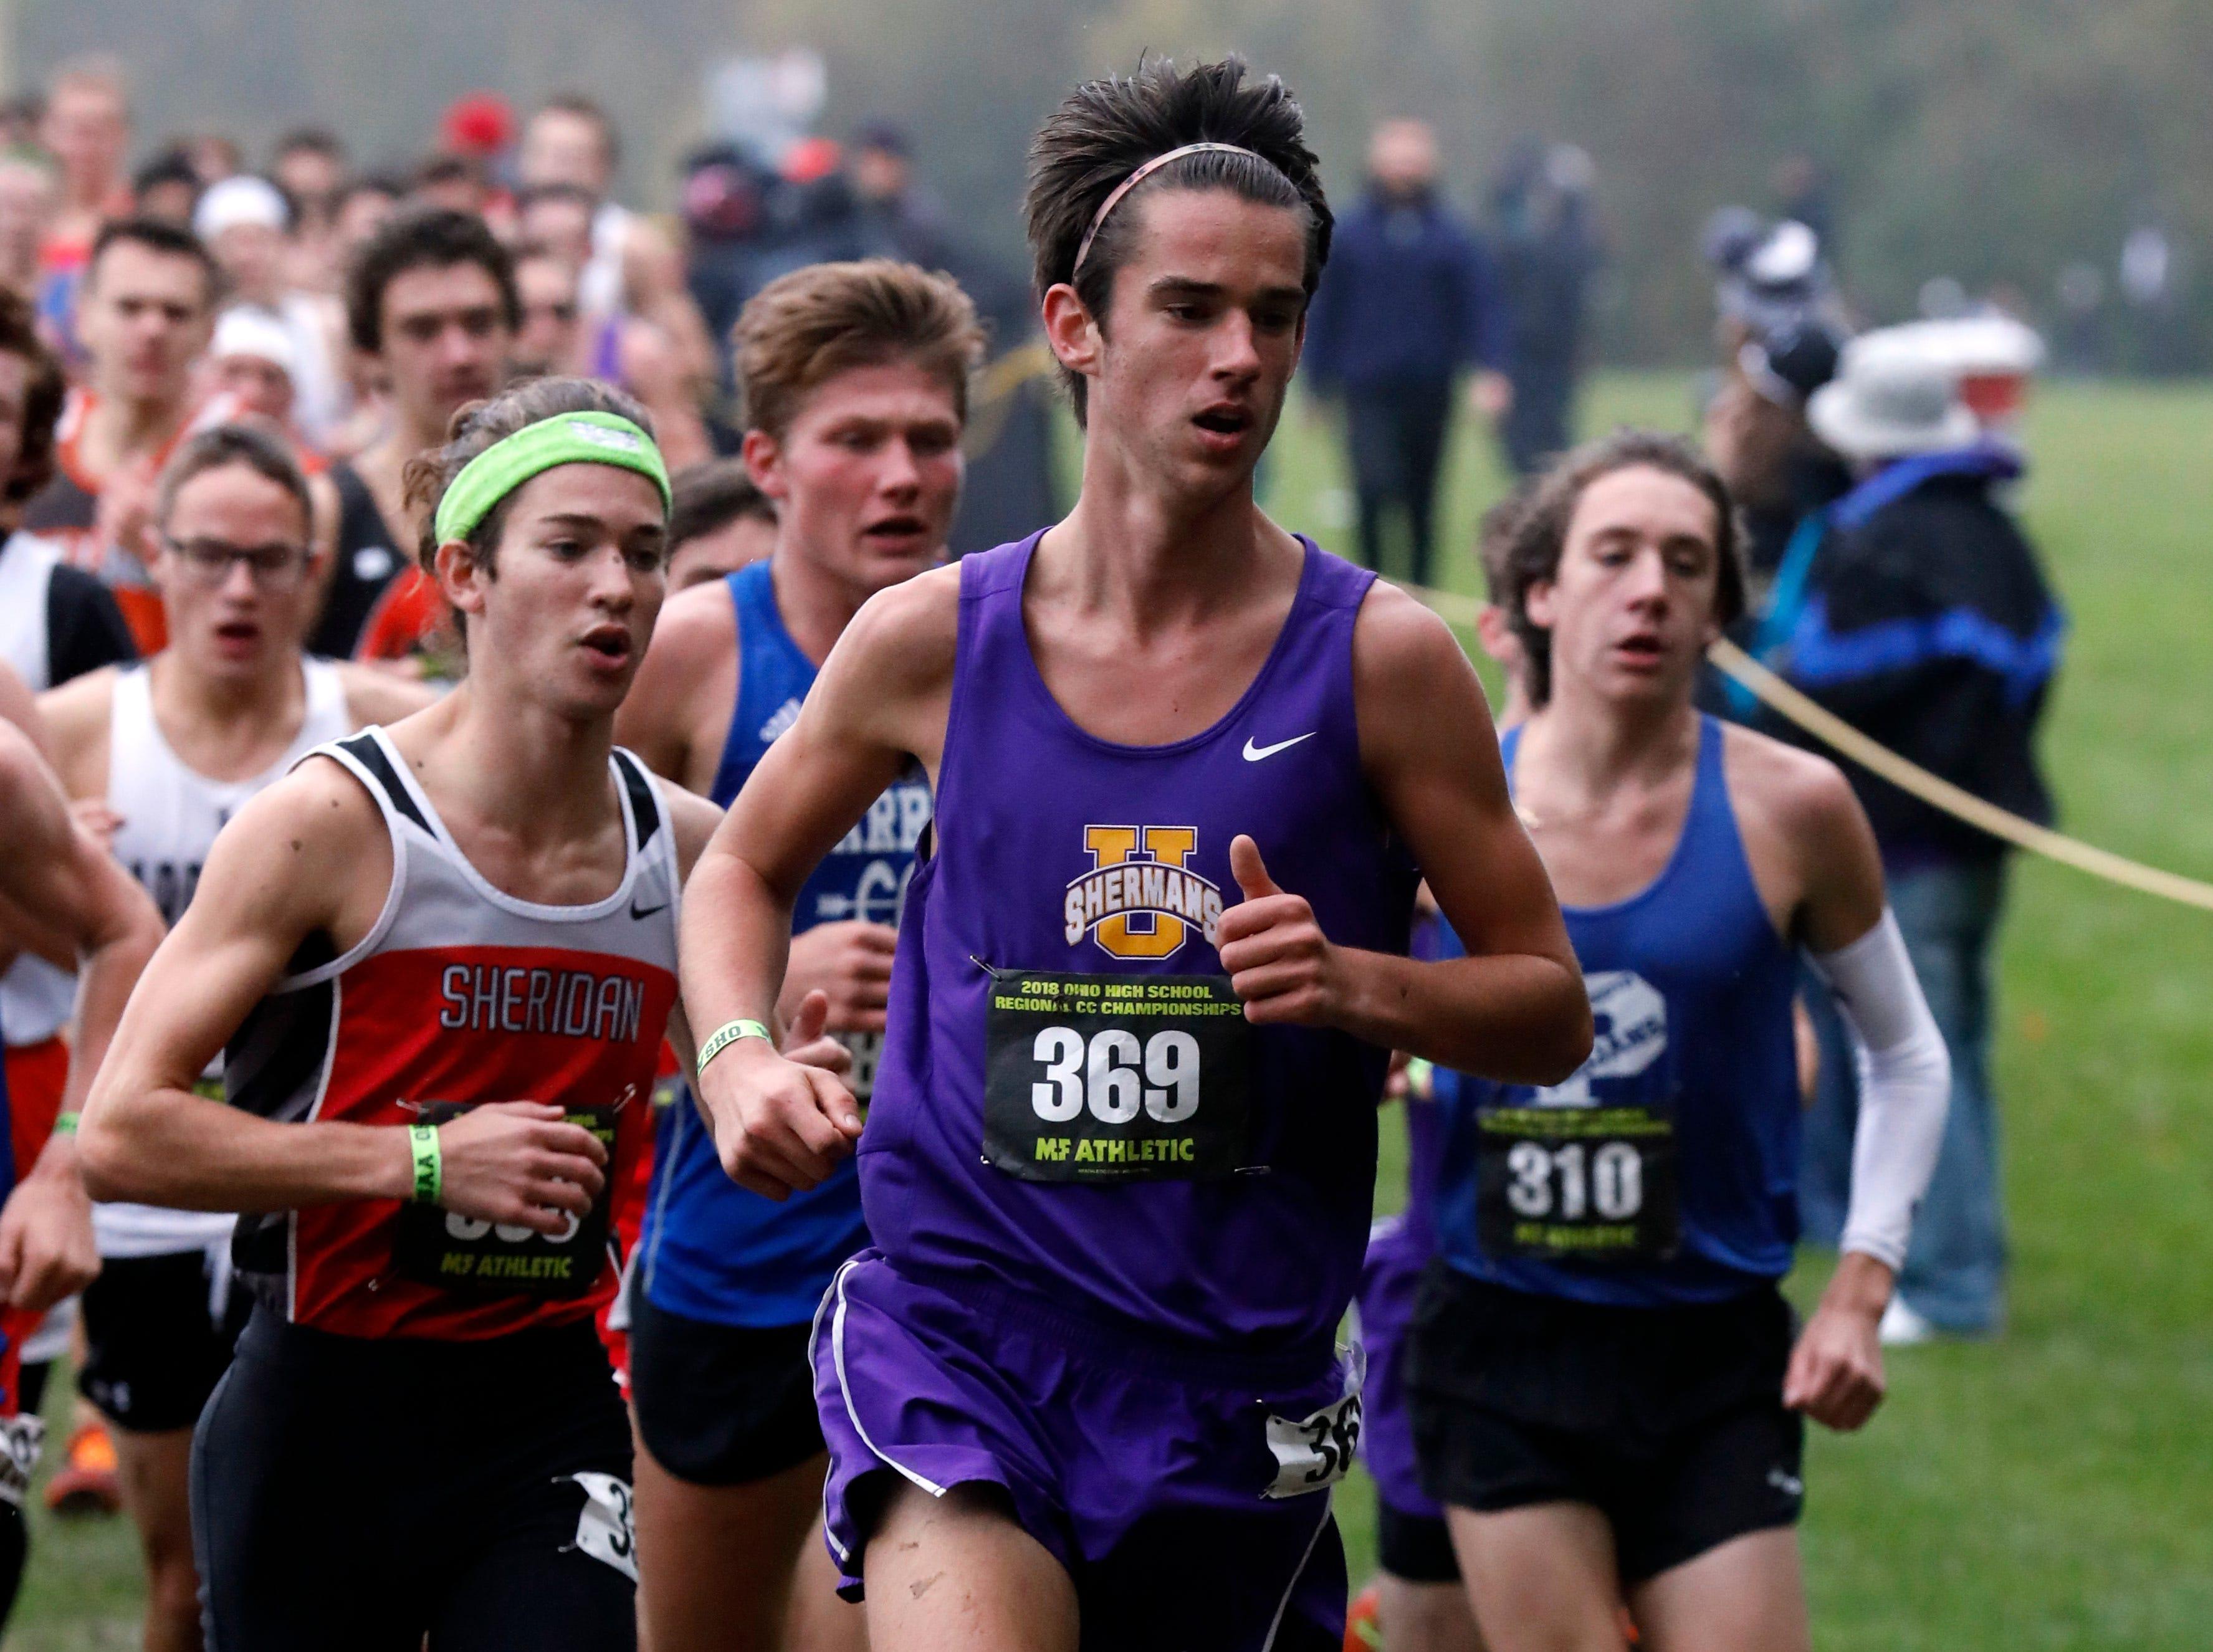 Unioto's Tucker Markko runs in the Regional Cross Country meet Saturday, Oct. 27, 2018, at Pickerington North High School in Pickerington.